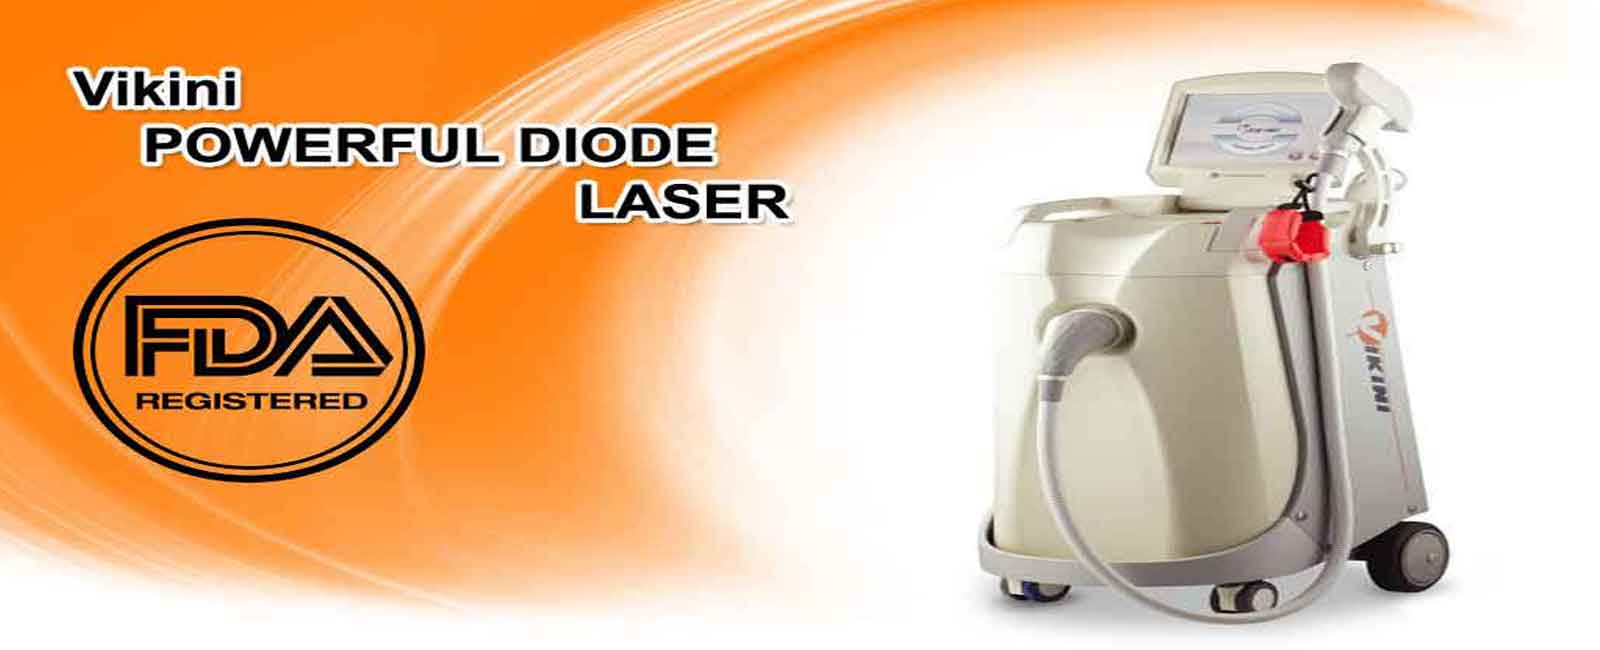 Diode Laser Vikini